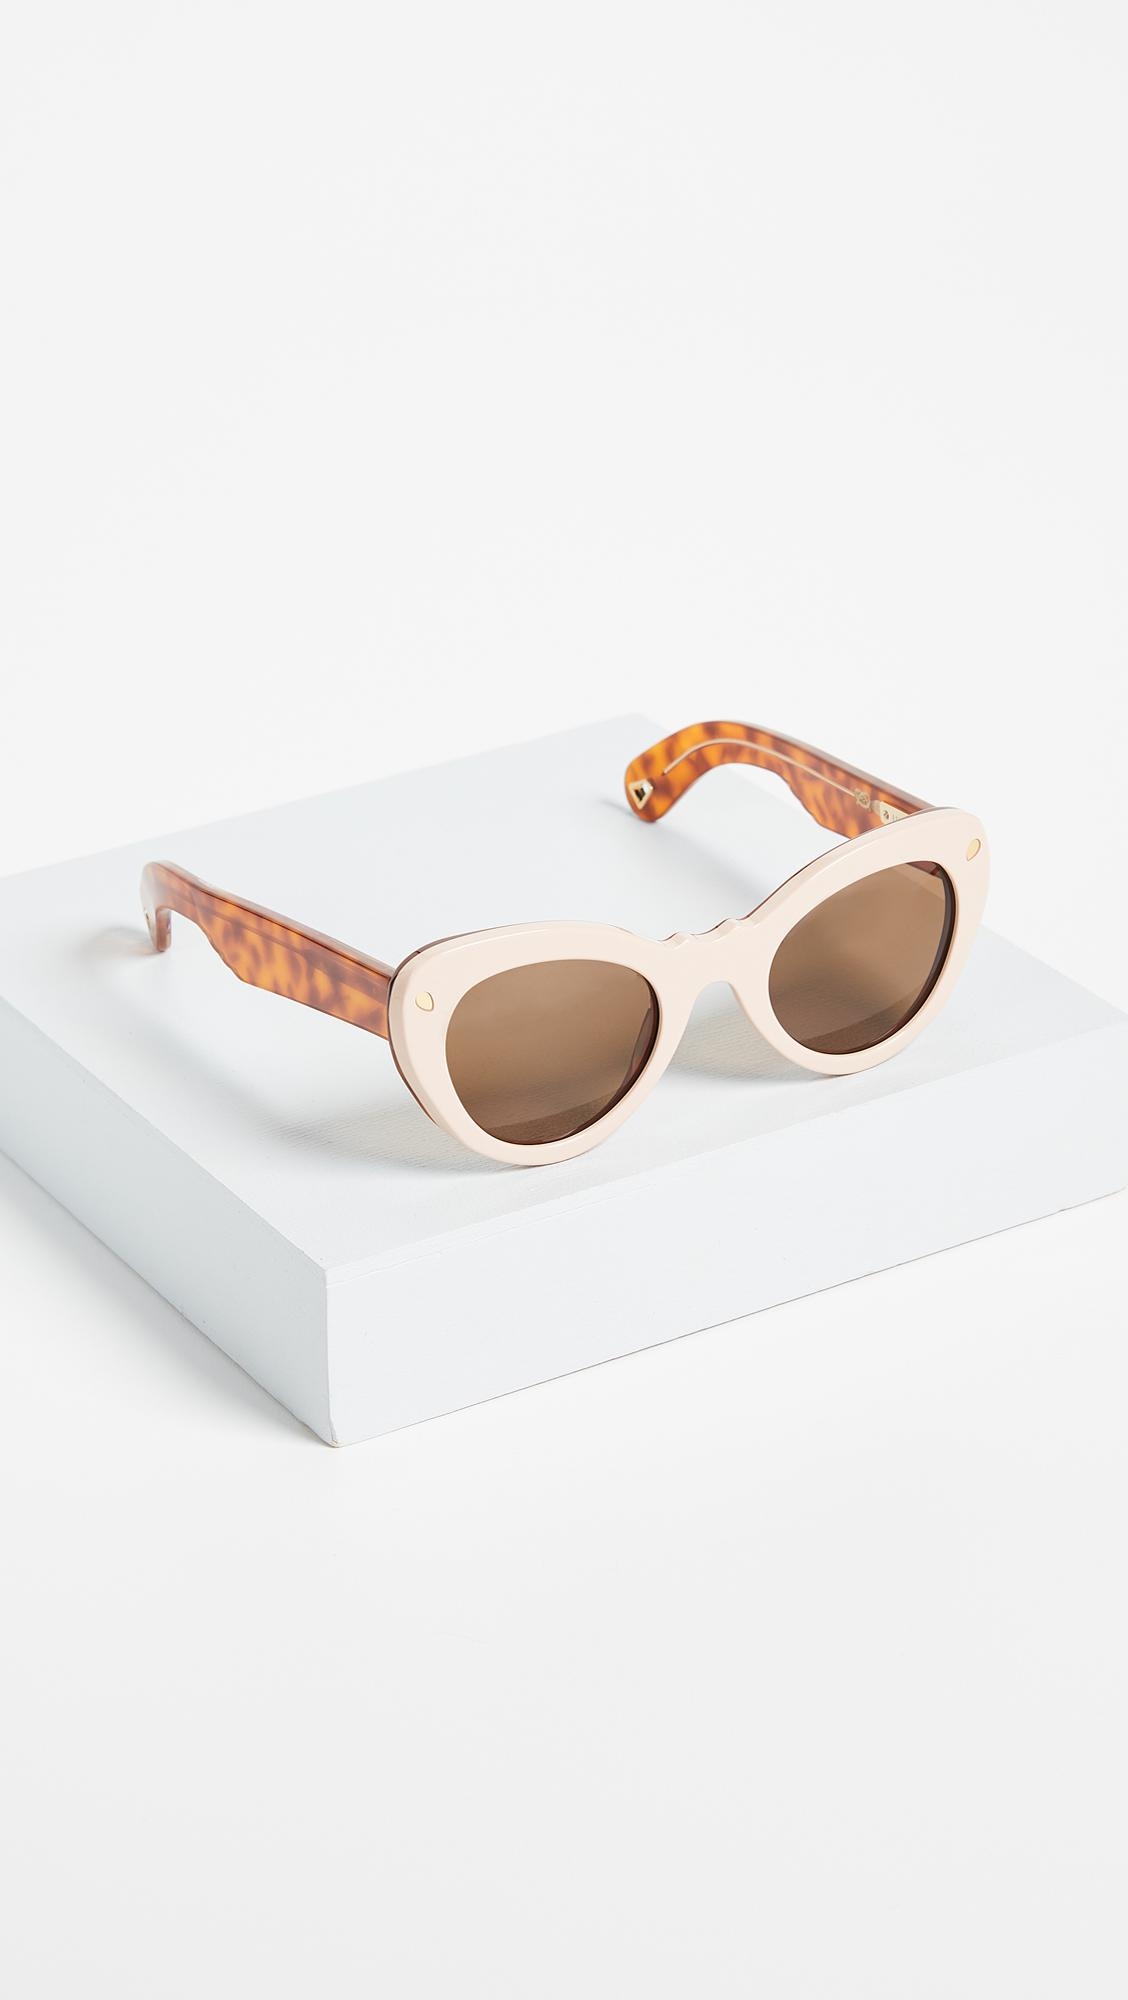 98308442229 Lyst - Lucy Folk Wingspan Sunglasses